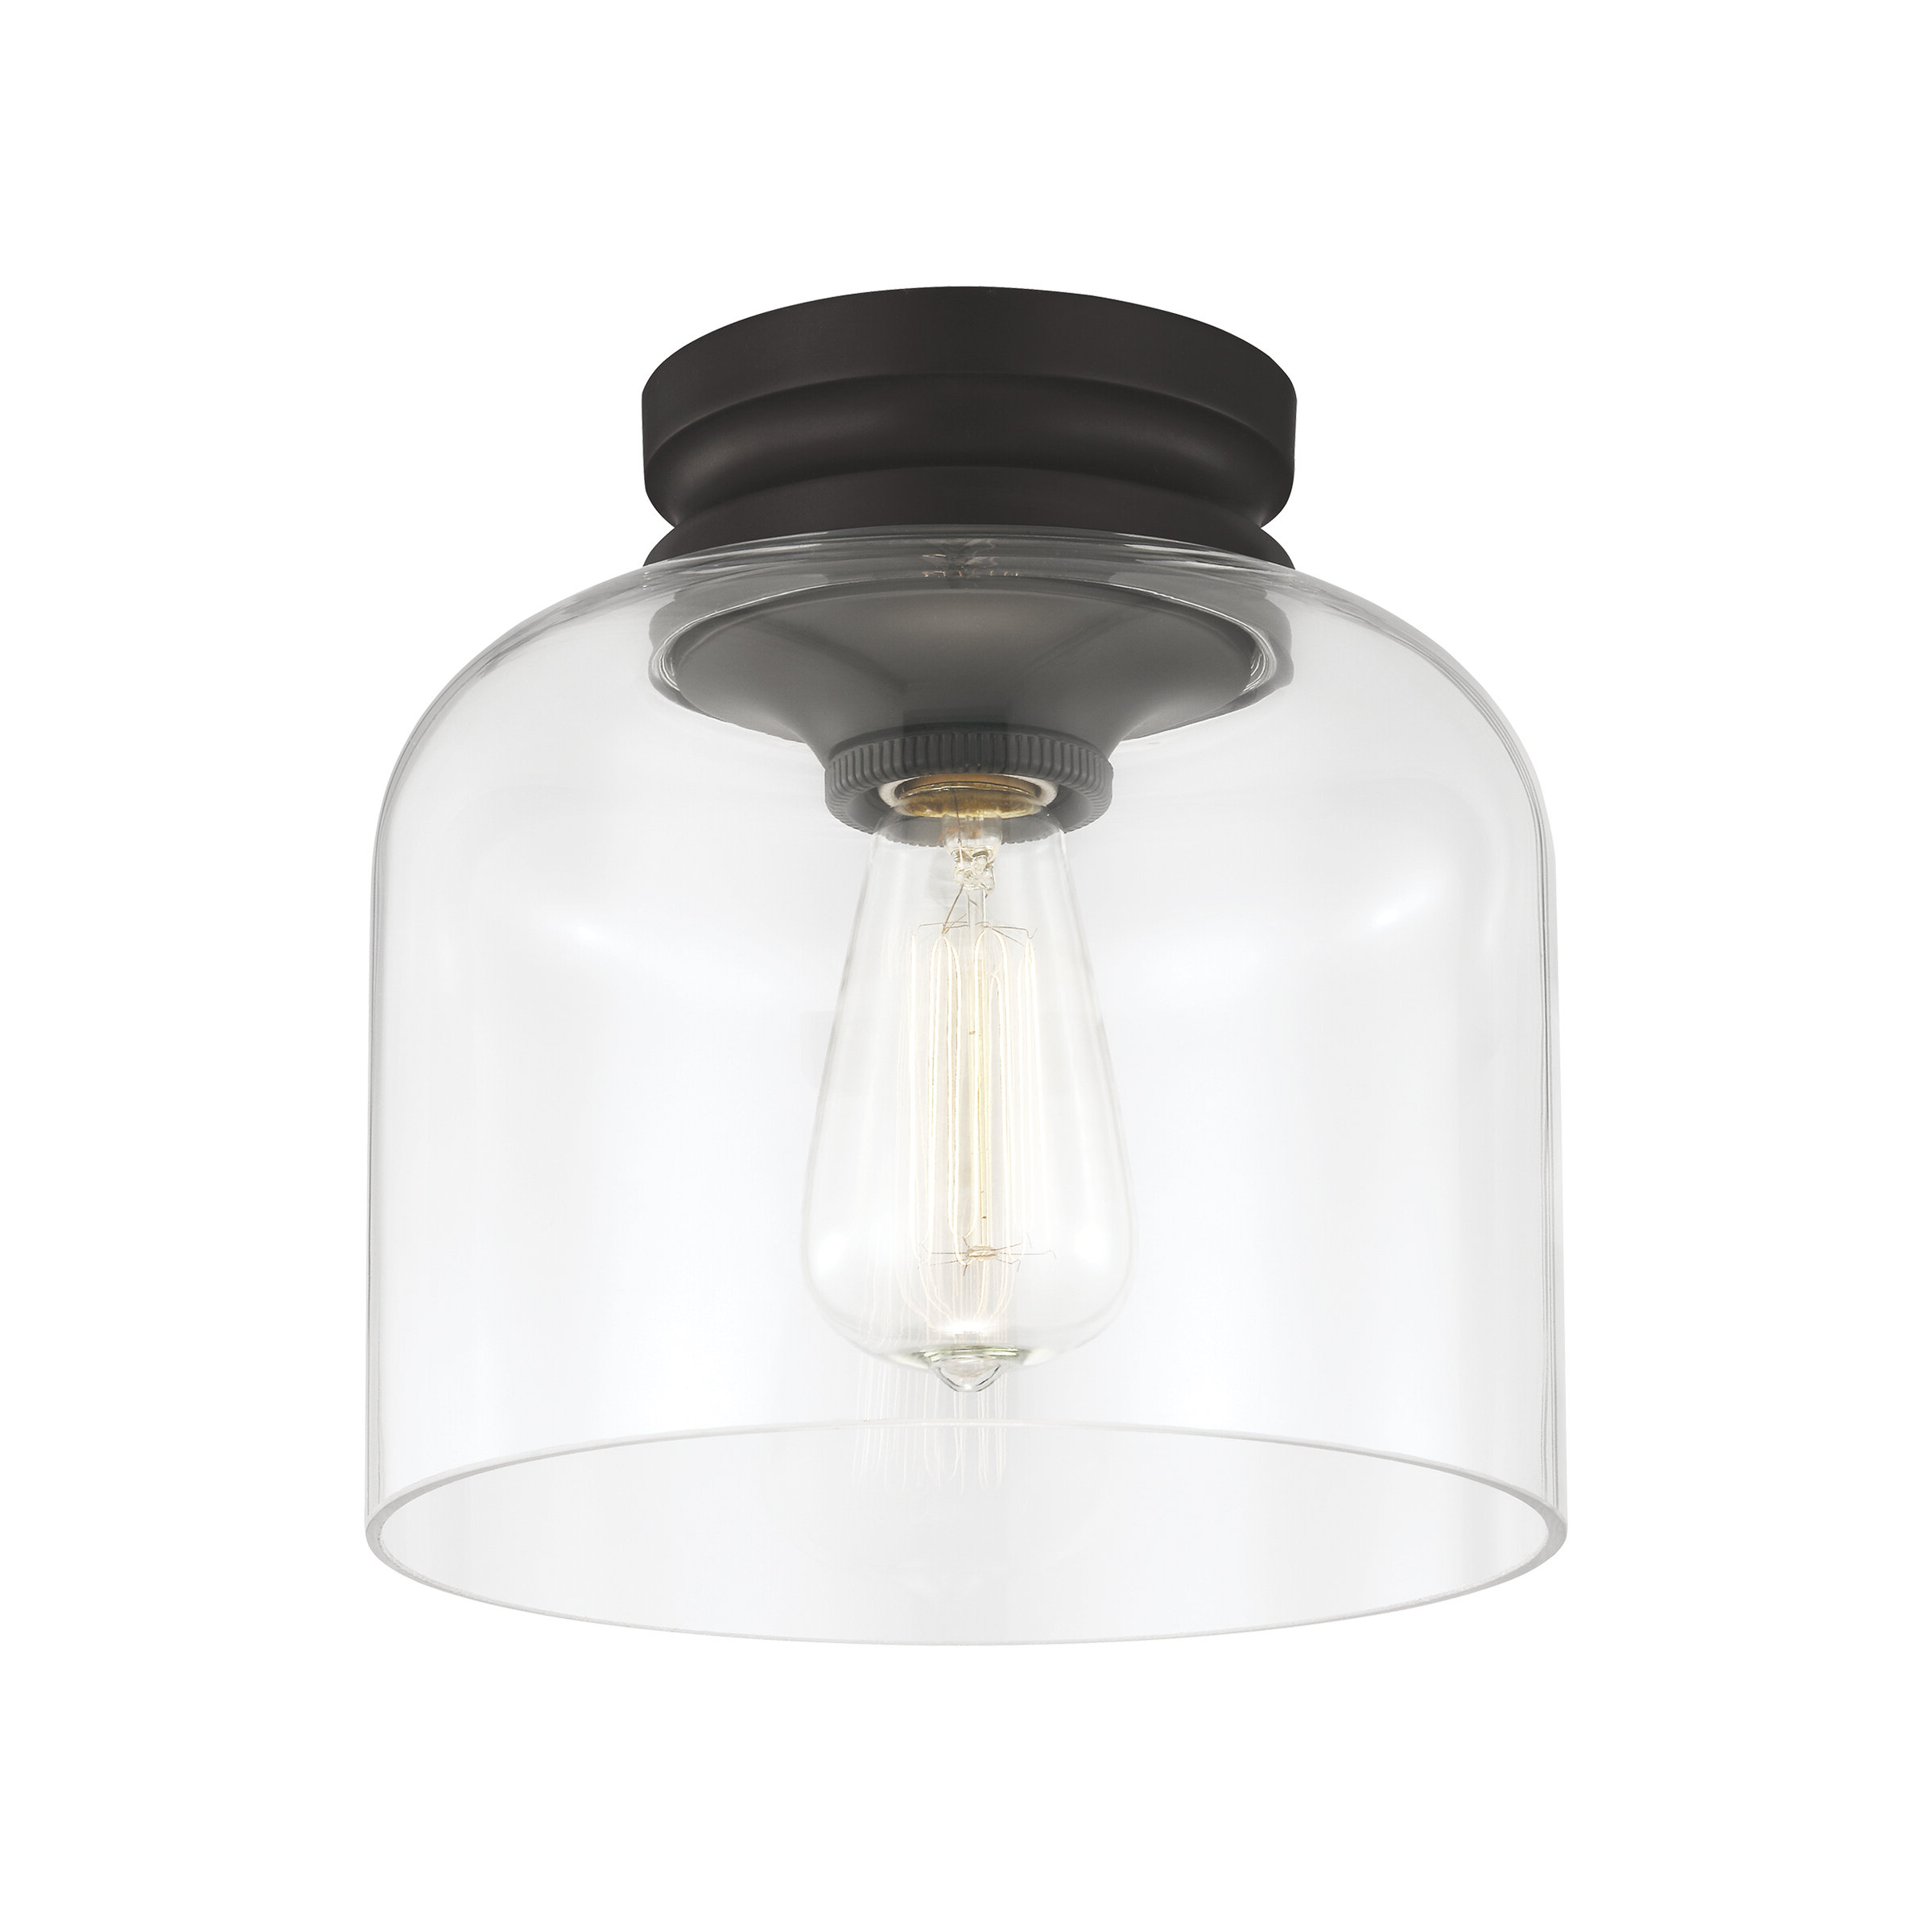 Preferred Nolan 1 Light Lantern Chandeliers In Nolan 1 Light Semi Flush Mount (View 19 of 25)